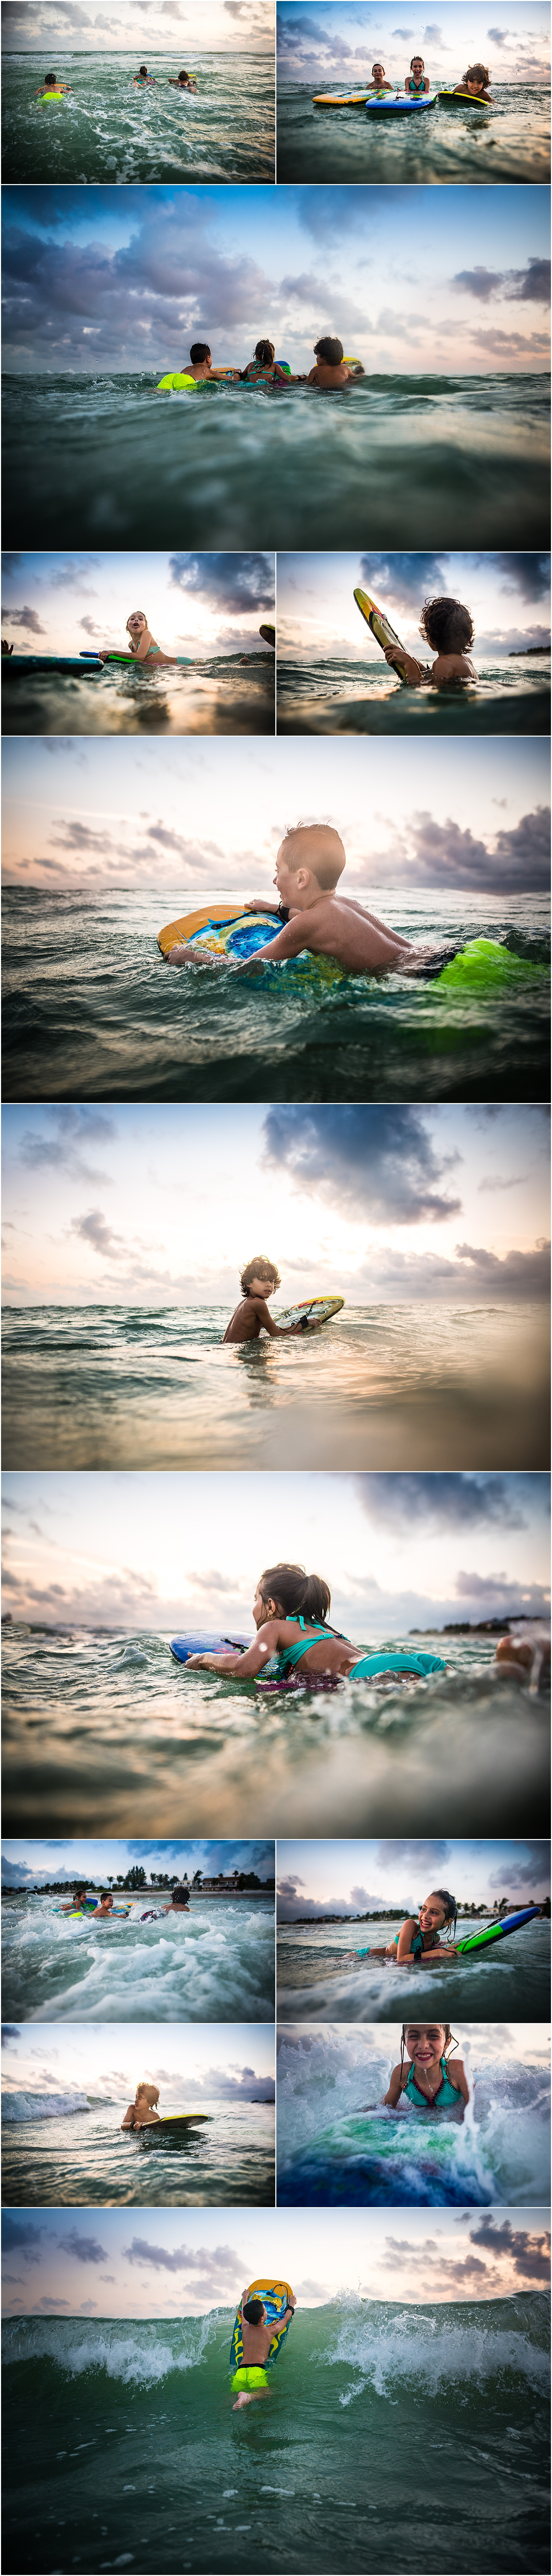 Beach_Friends7.jpg